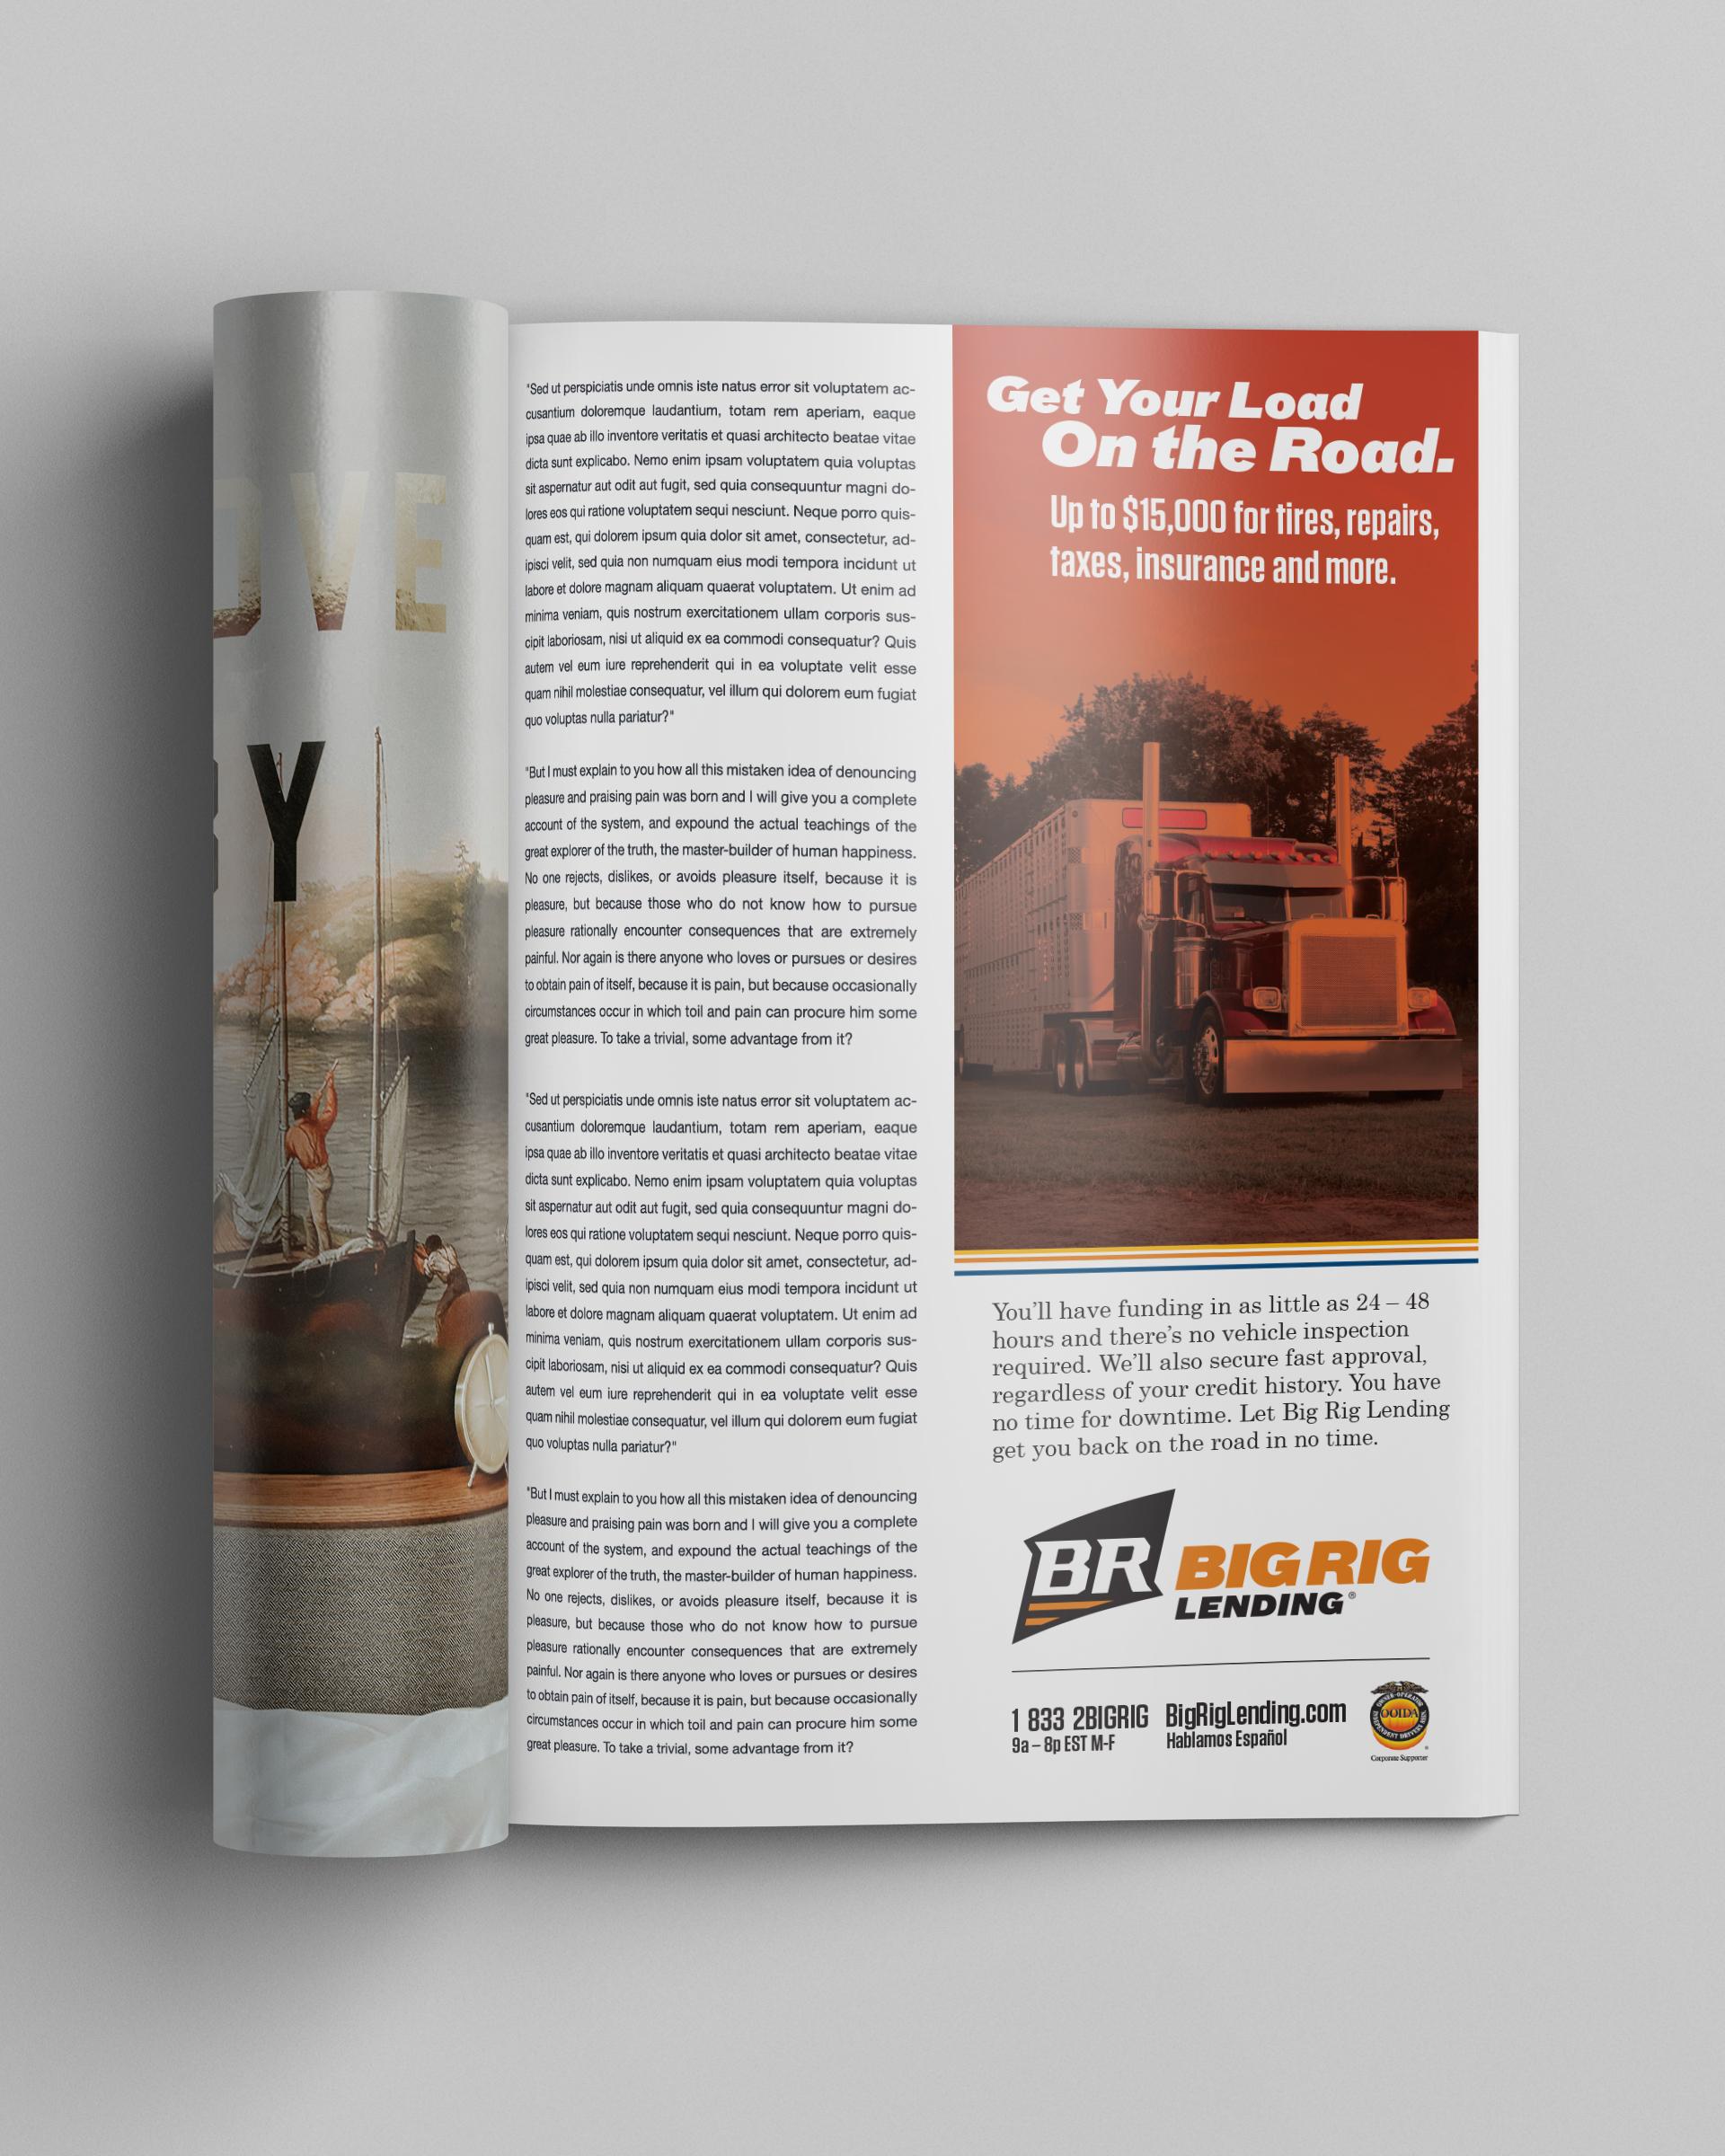 BRL_magazine2.jpg